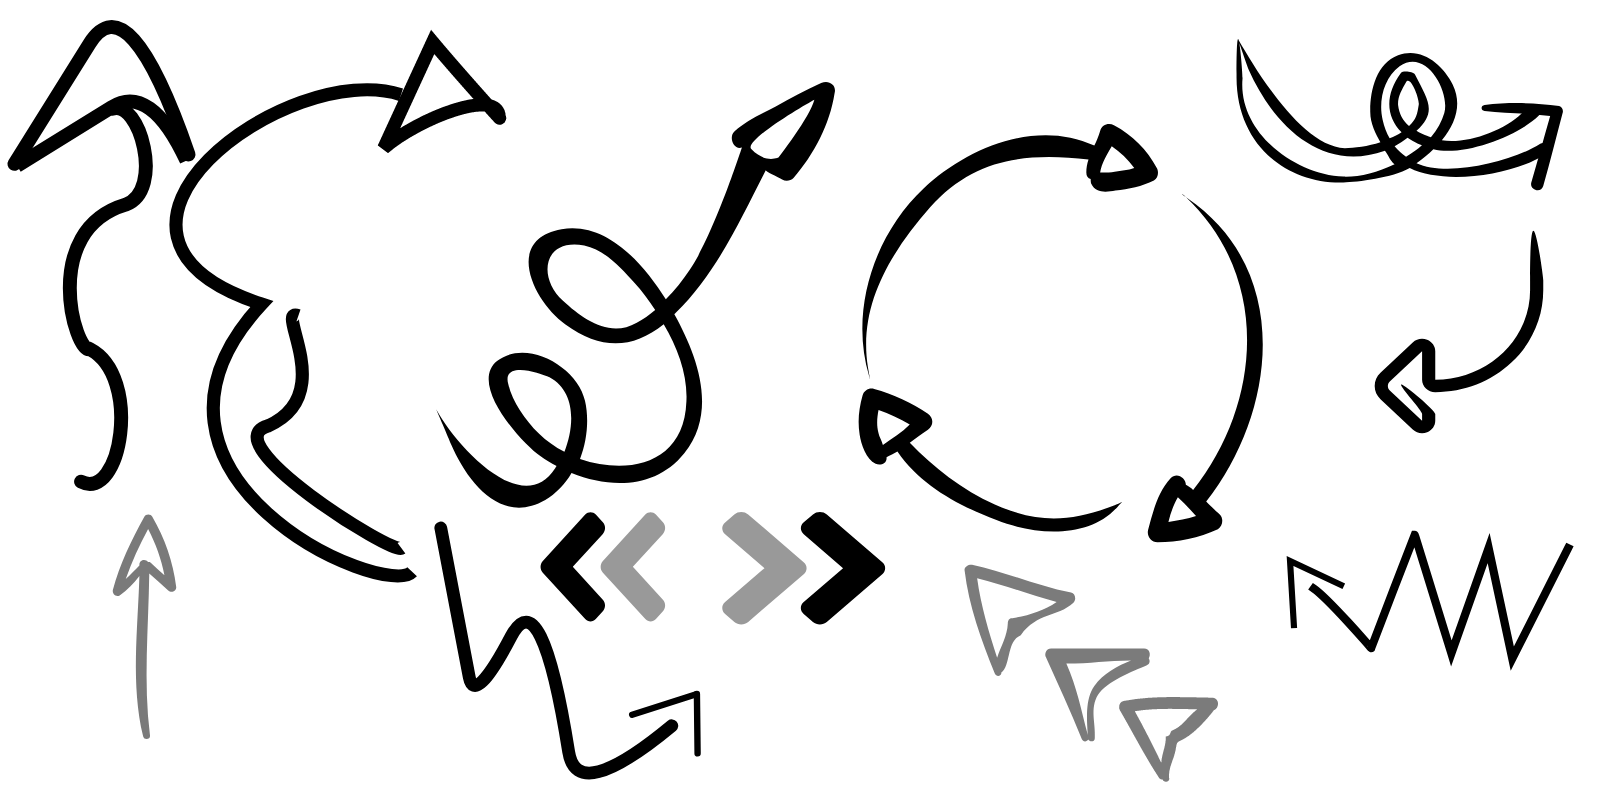 Website accent packs for WEbflow